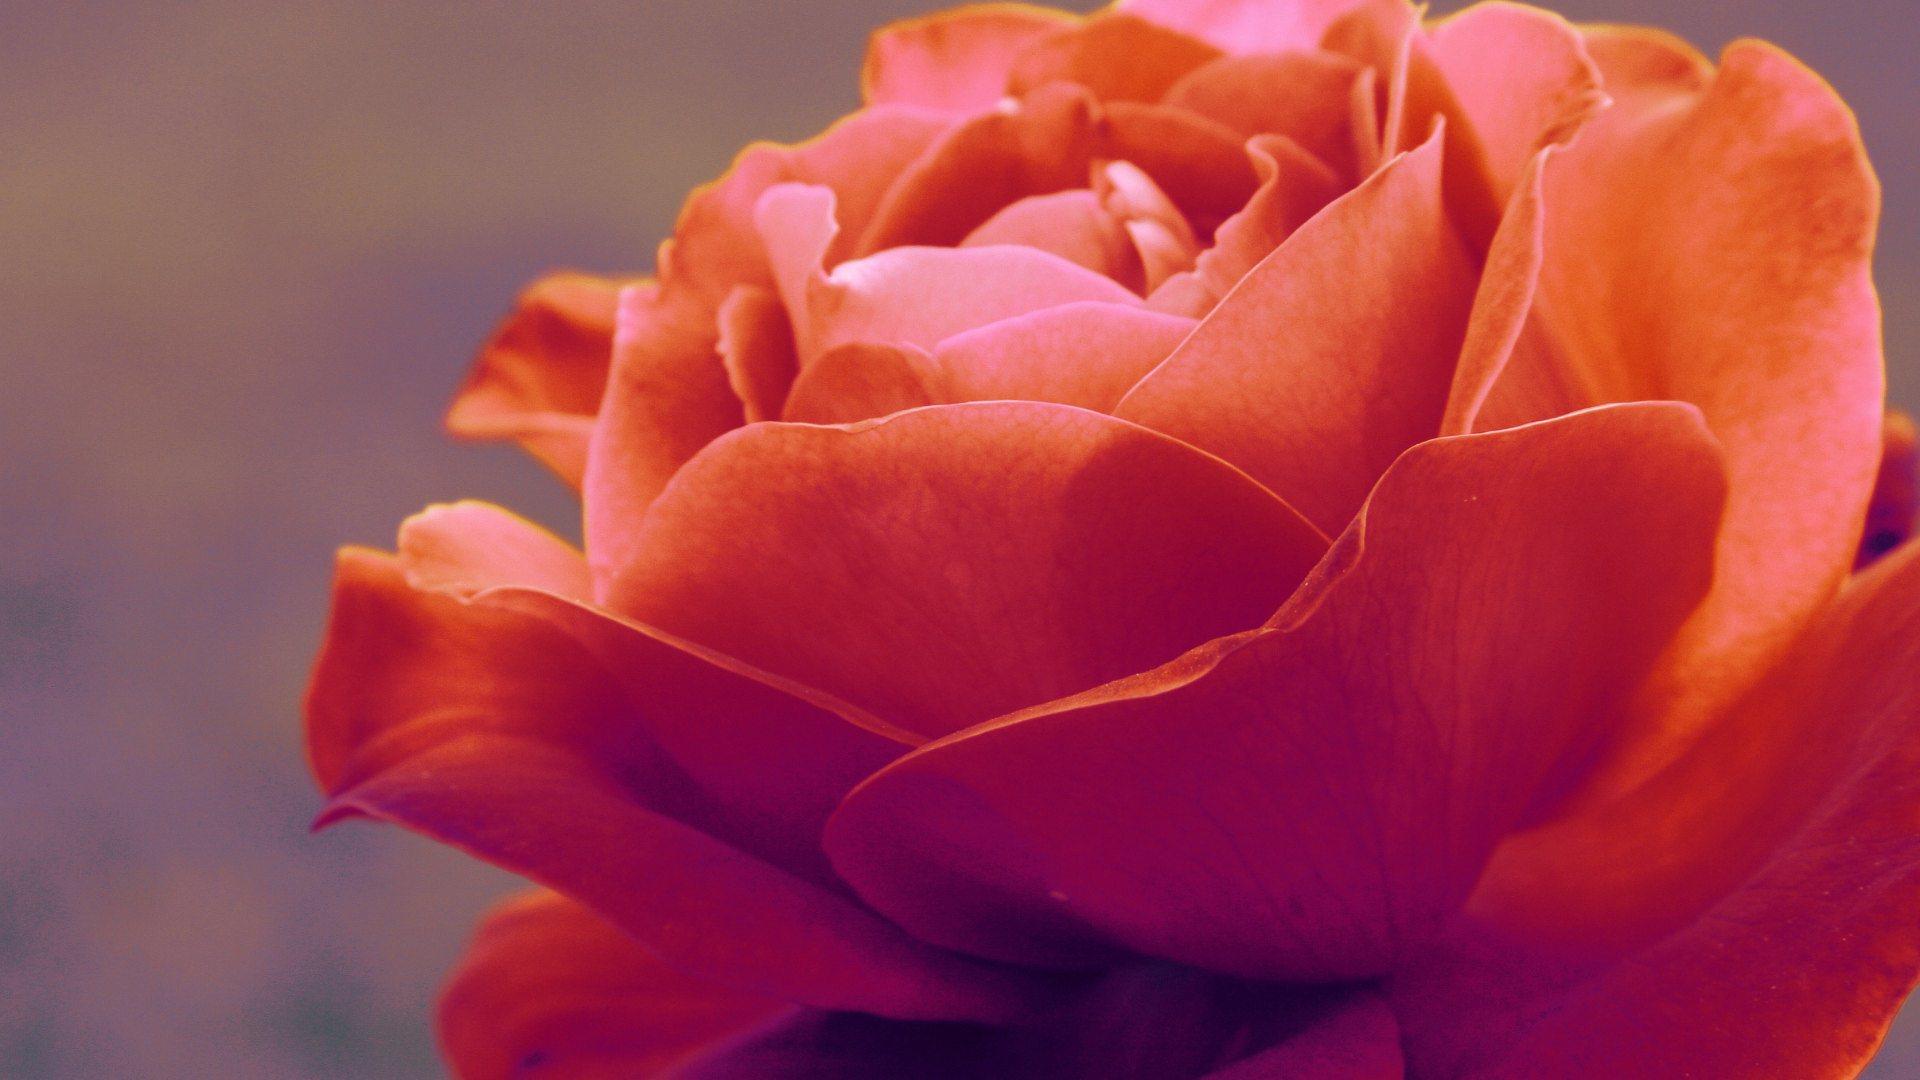 orange rose wallpaper background